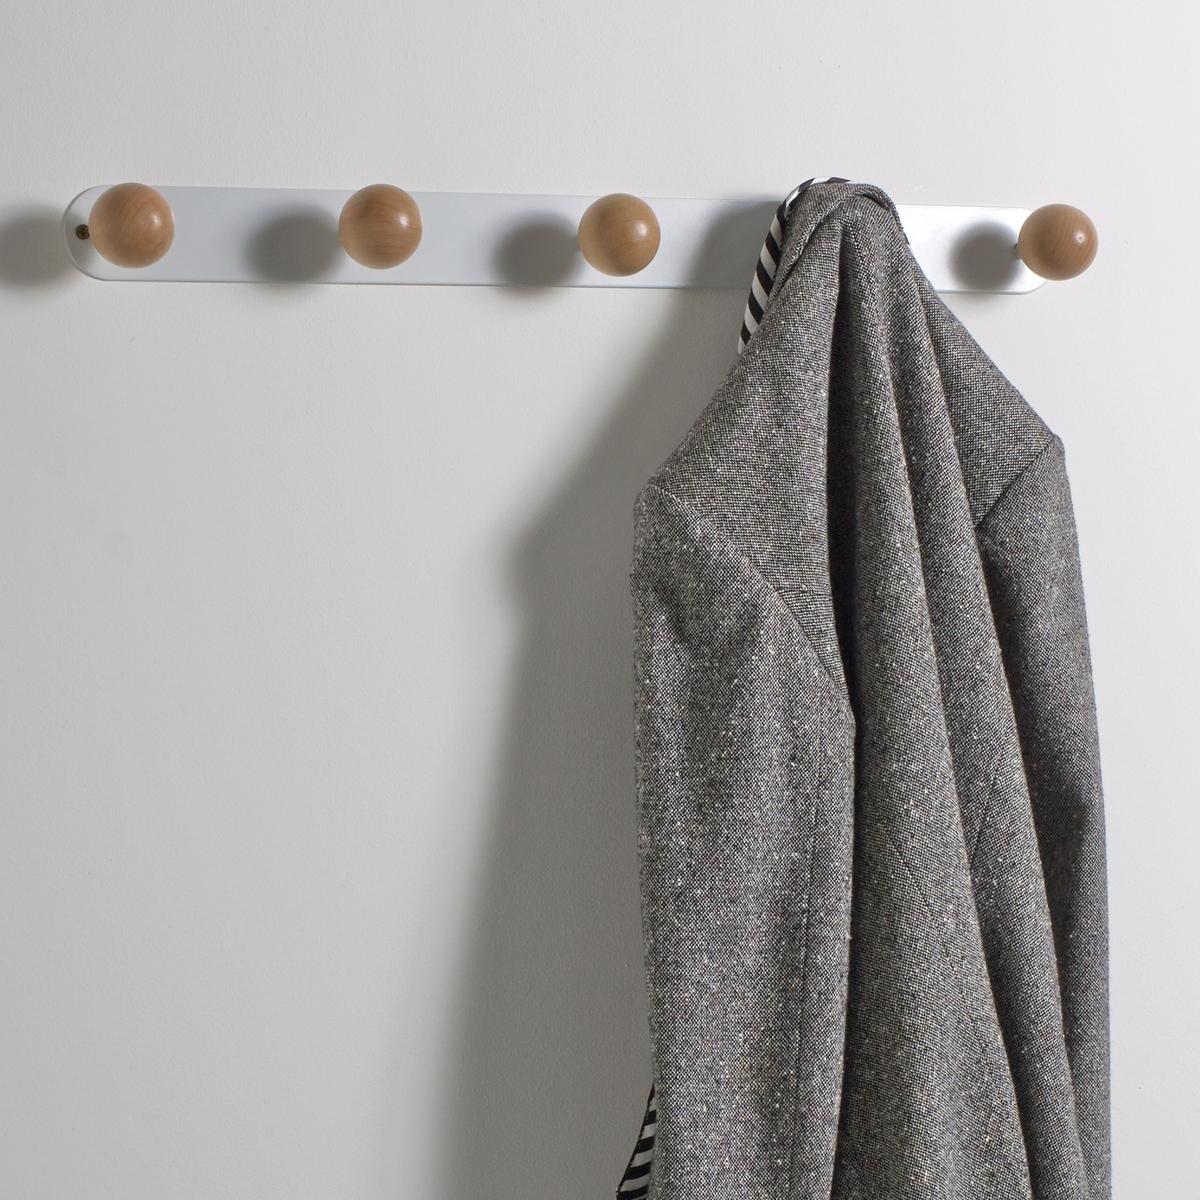 цена Вешалка La Redoute Настенная с крючками AGAMA единый размер белый онлайн в 2017 году